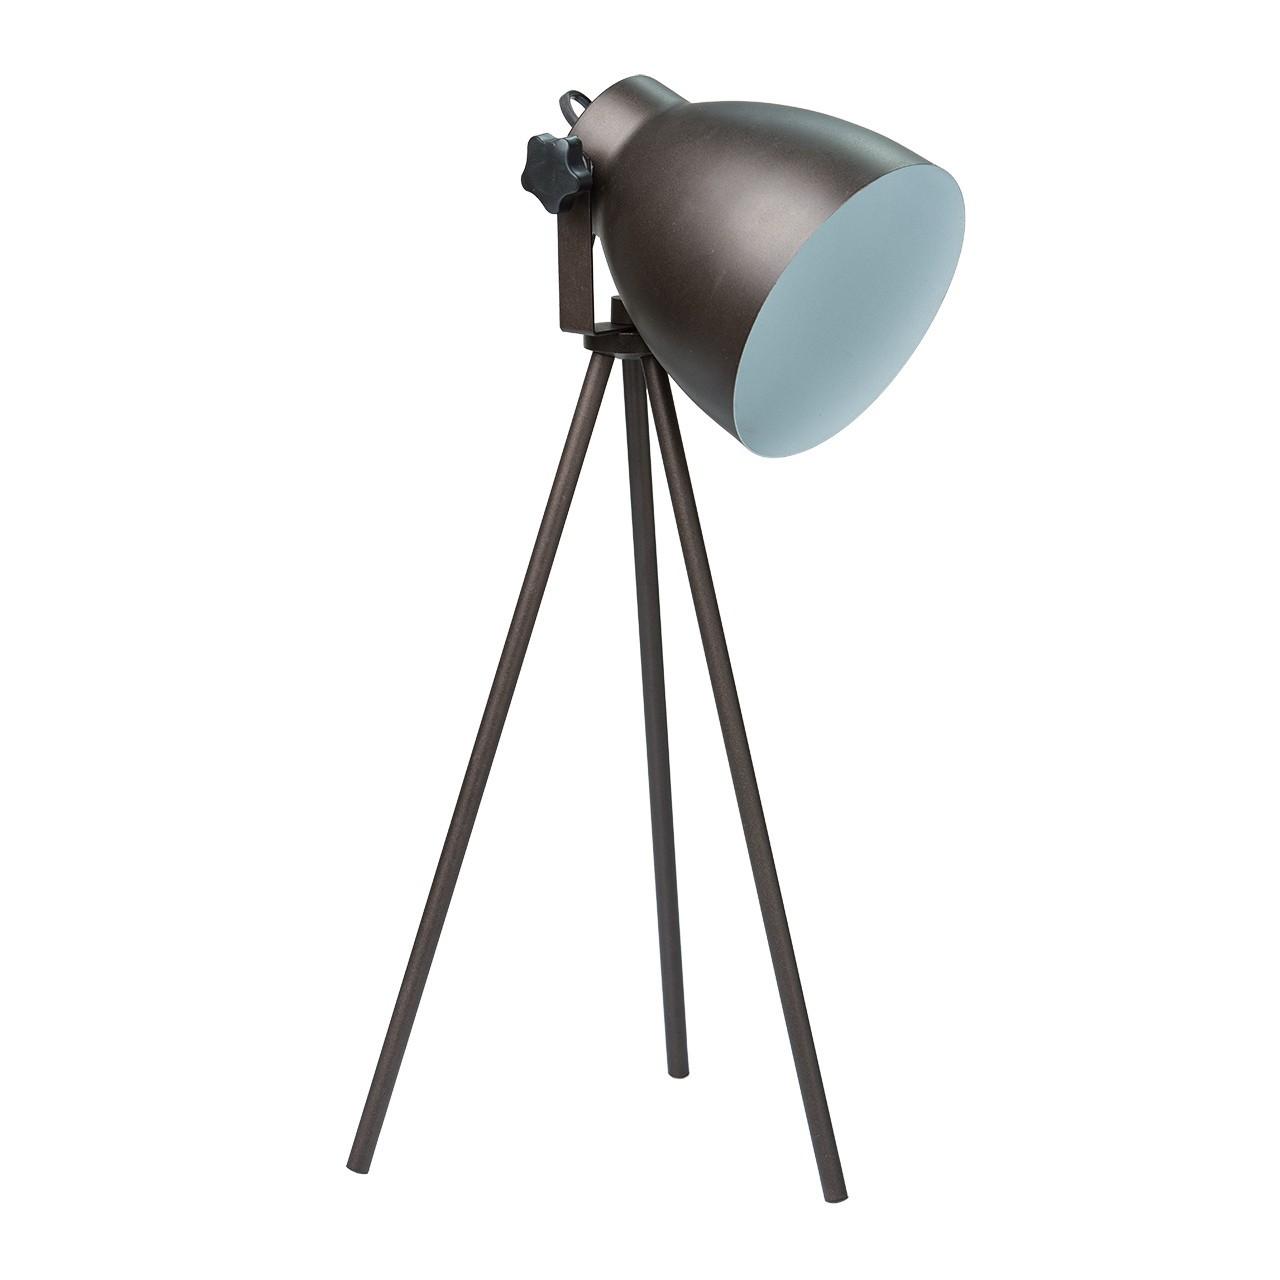 Лампа настольная Regenbogen 497032501 Хоф